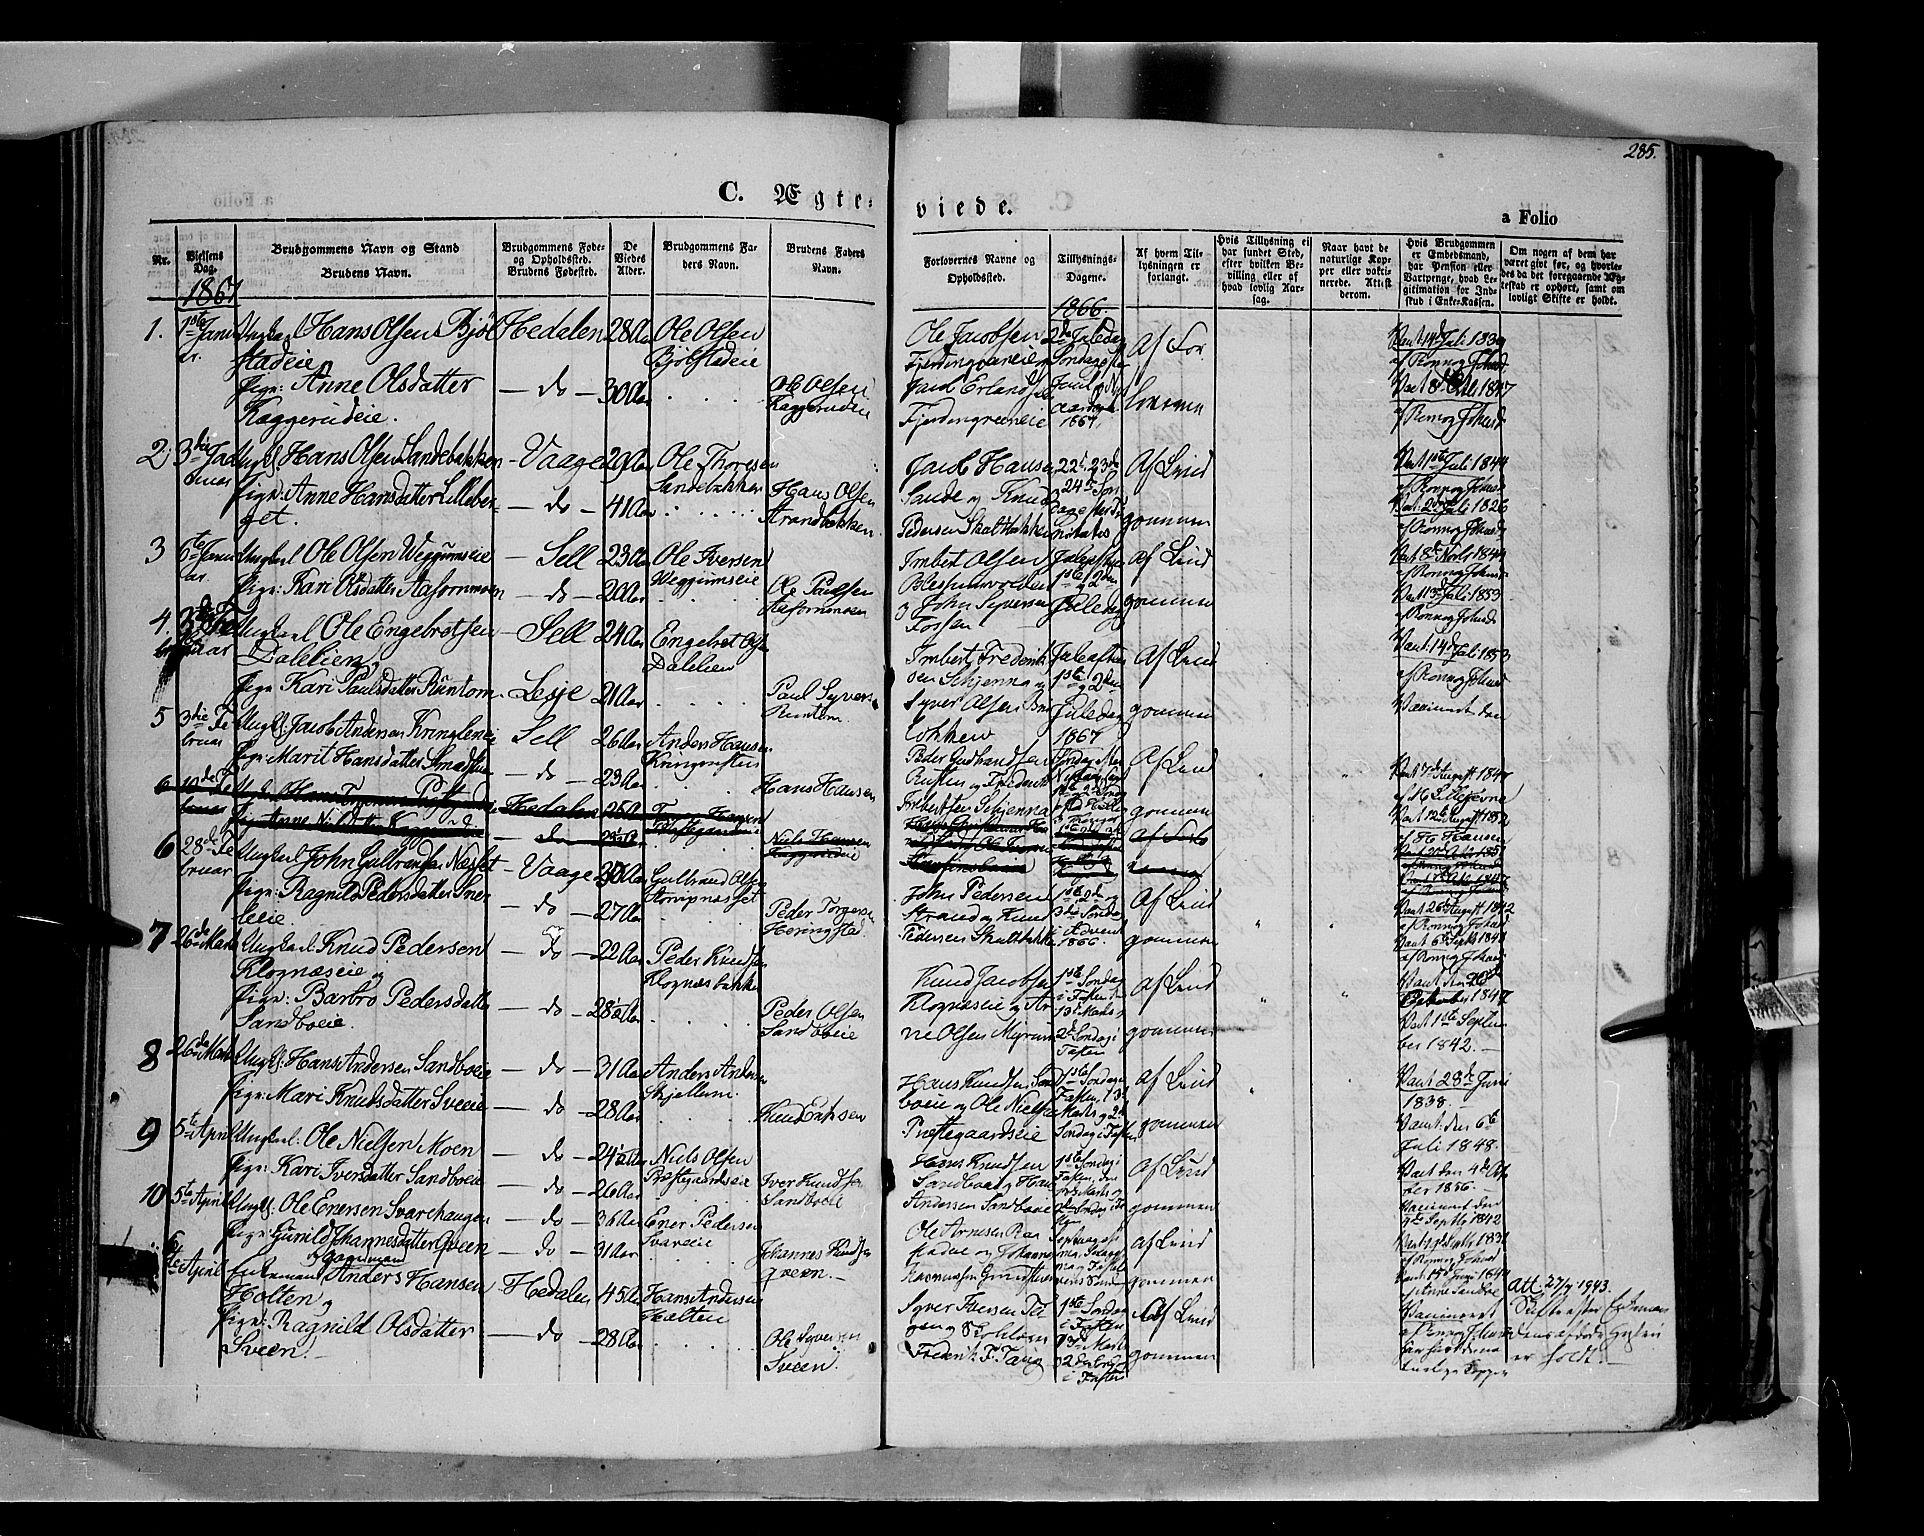 SAH, Vågå prestekontor, Ministerialbok nr. 6 /1, 1856-1872, s. 285